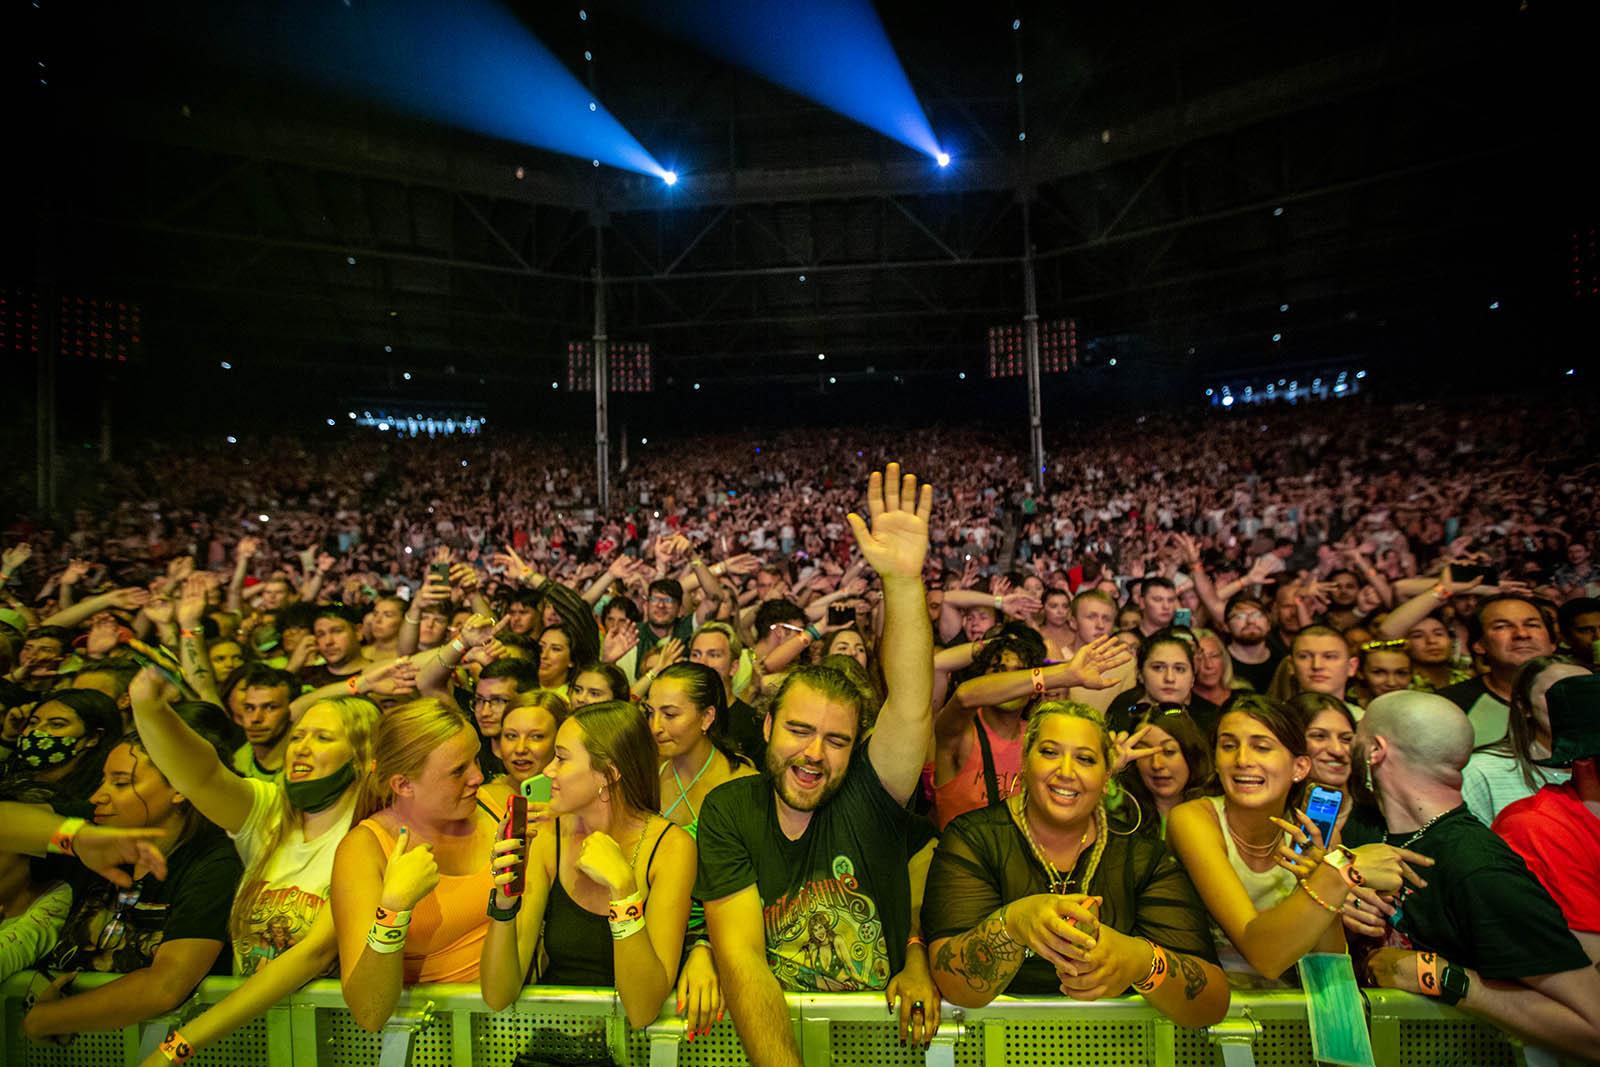 Miley Cyrus crowd.